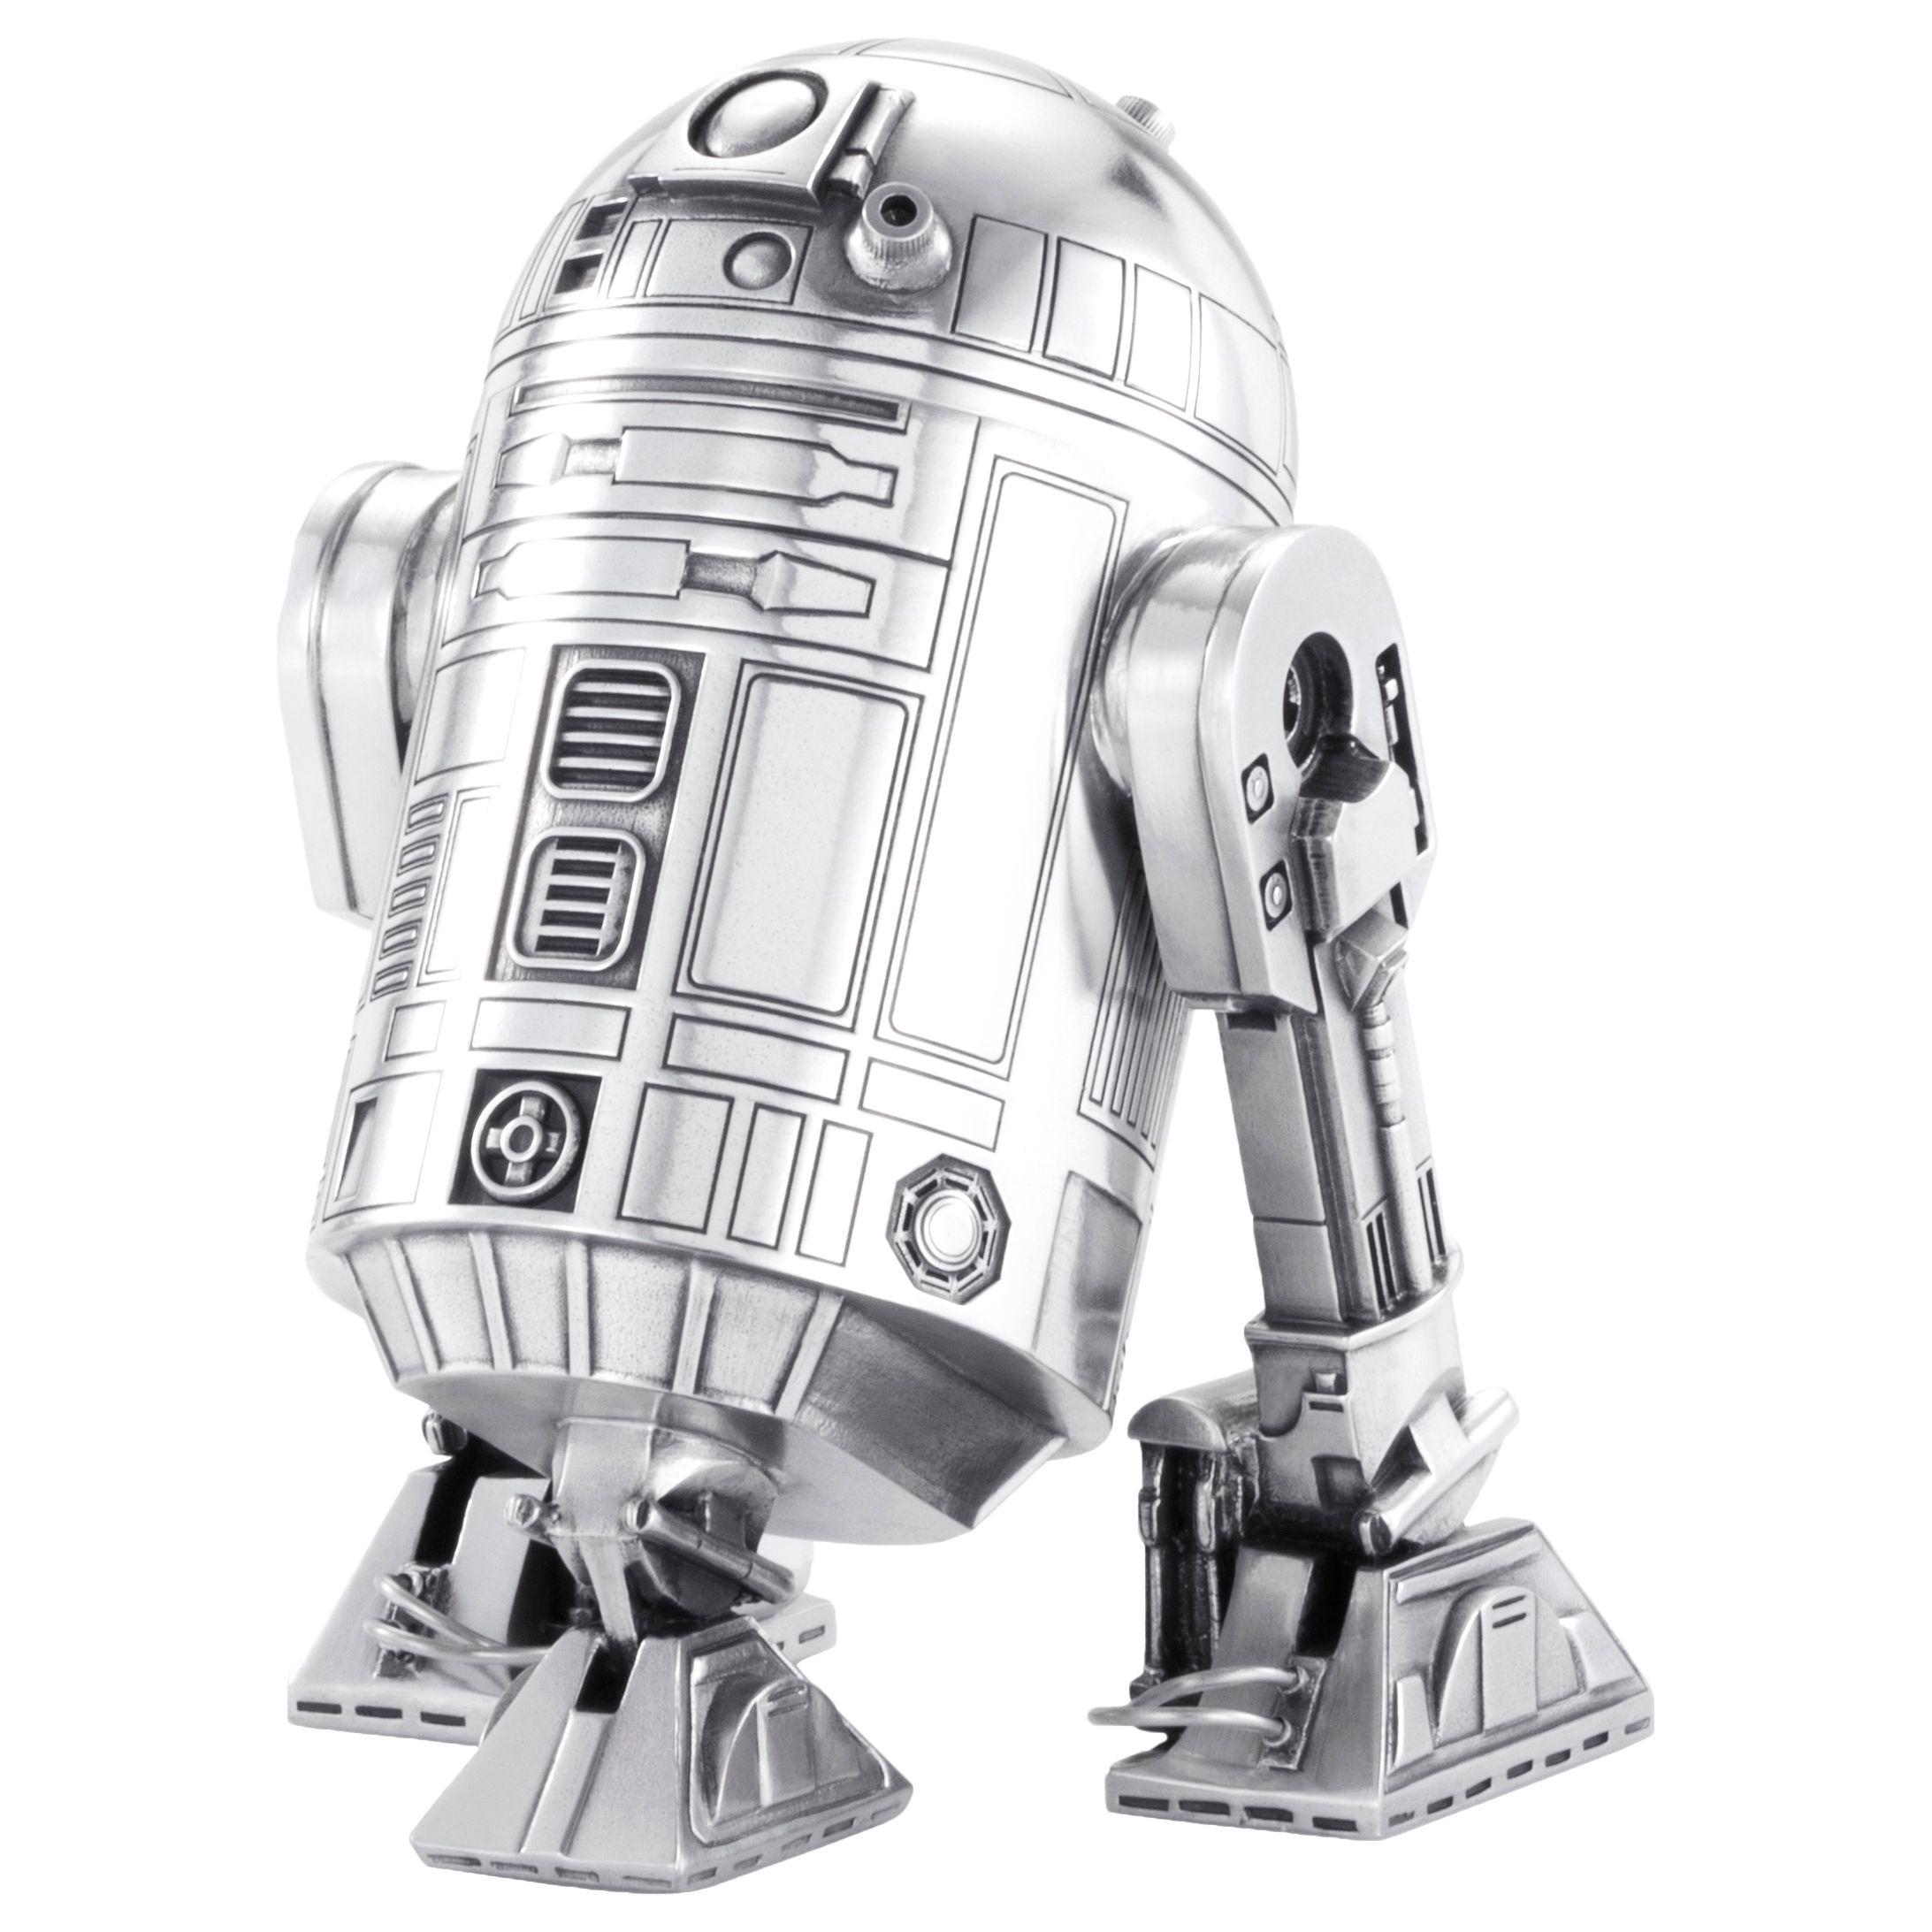 Royal Selangor Royal Selangor Star Wars R2-D2 Canister